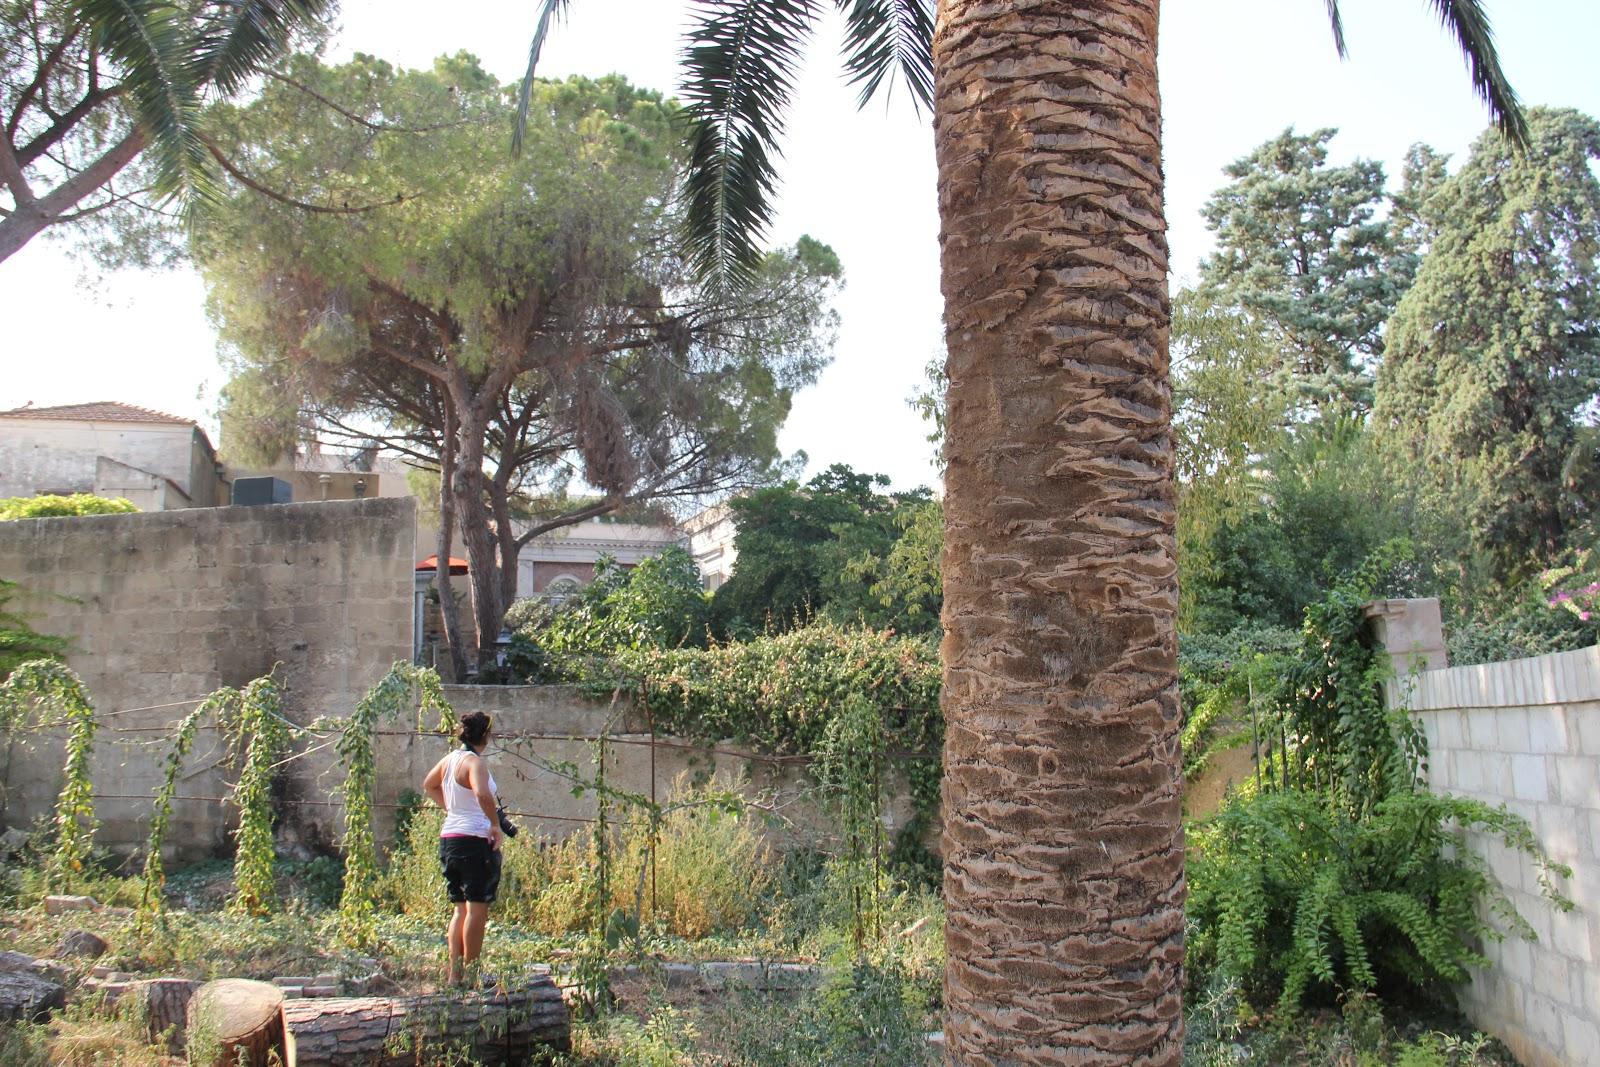 http://4.bp.blogspot.com/-D_IiWVV8dr4/Tmpp4ZfwuDI/AAAAAAAAJt8/G7WtJPe3sEA/s1600/11+Assalto+al+giardino+Bernalda+27-08-11.JPG